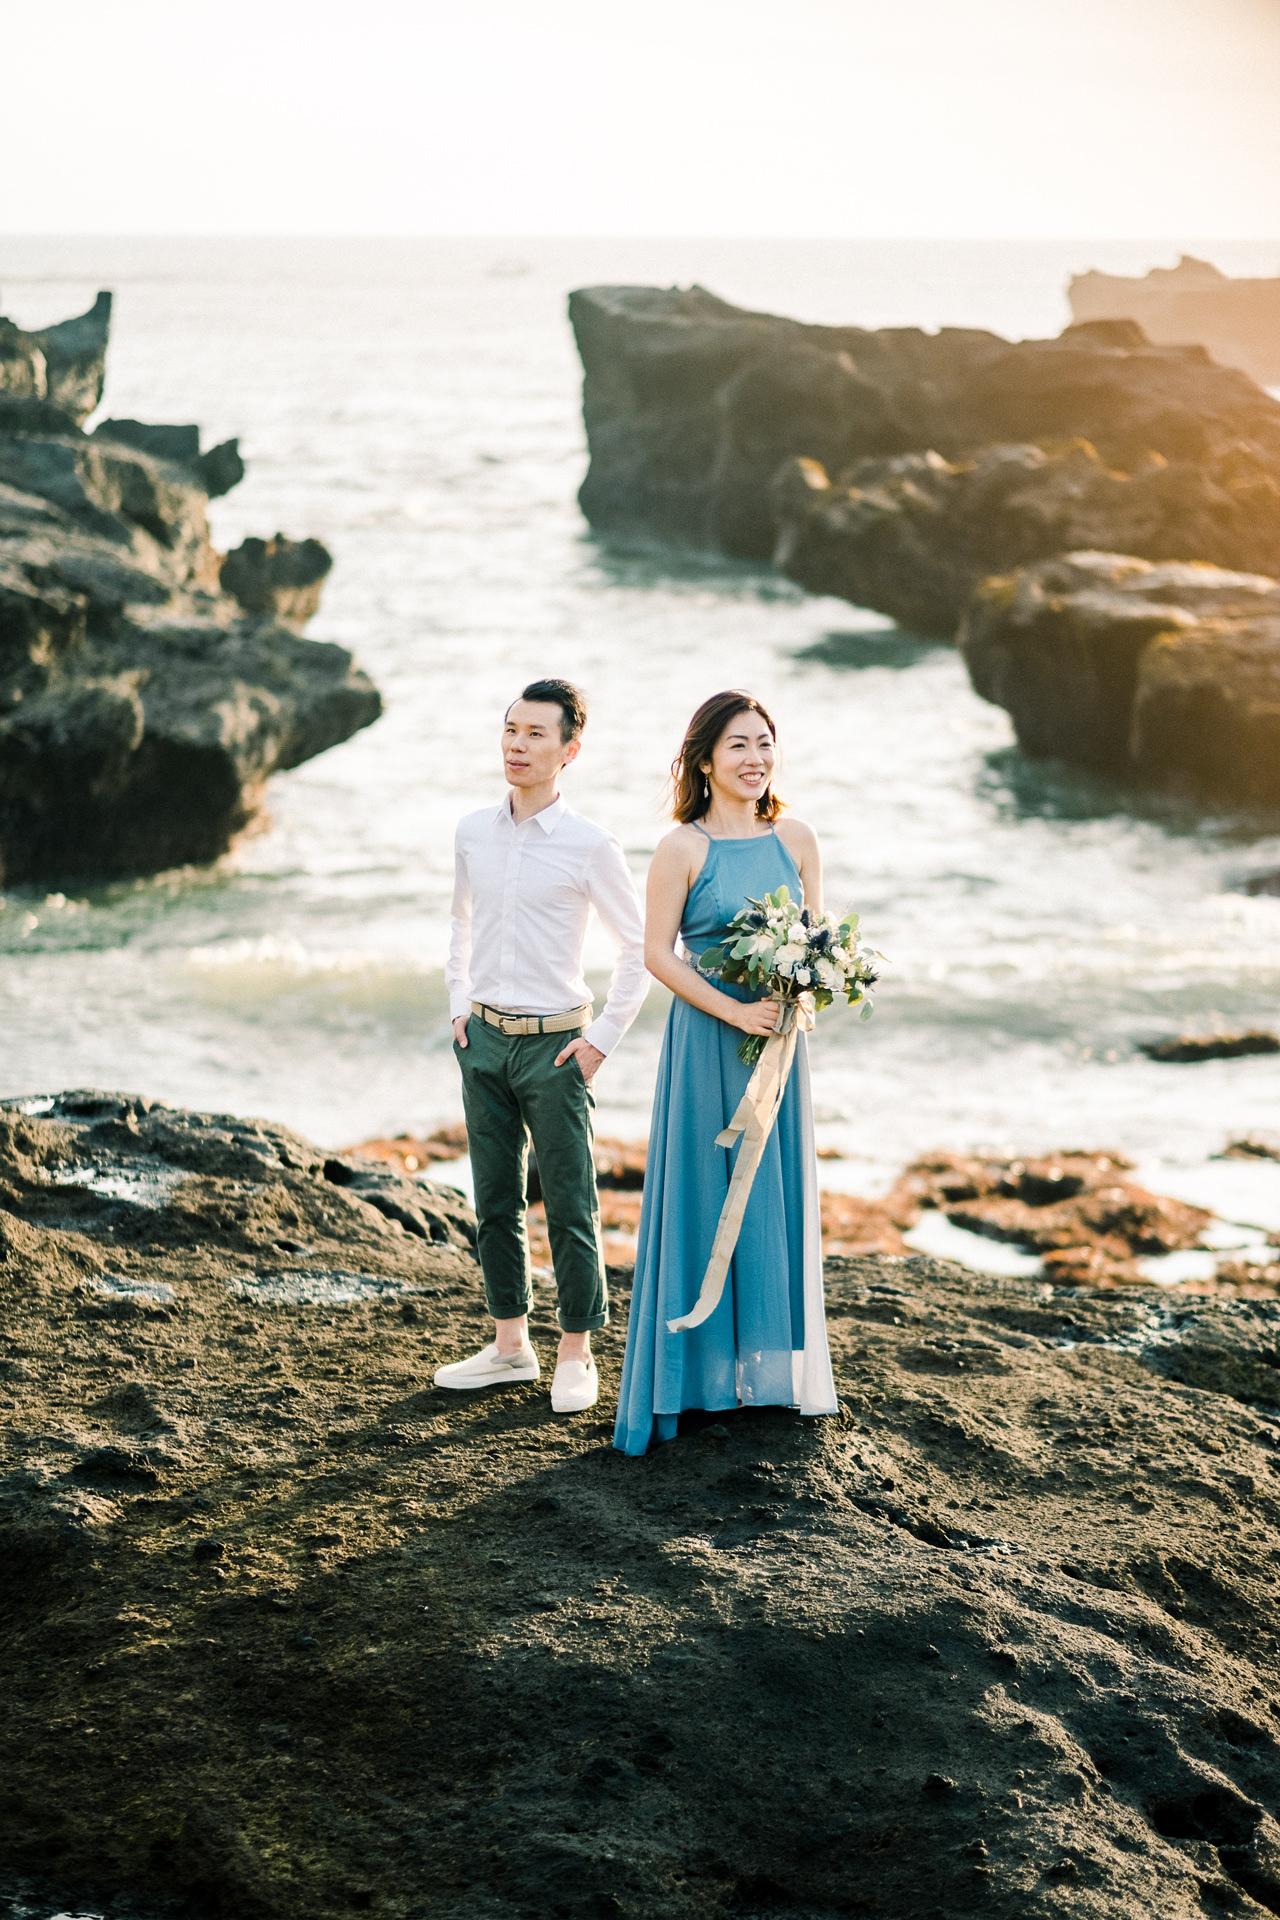 E&P: Sunset in Canggu Bali Engagement Photography 11